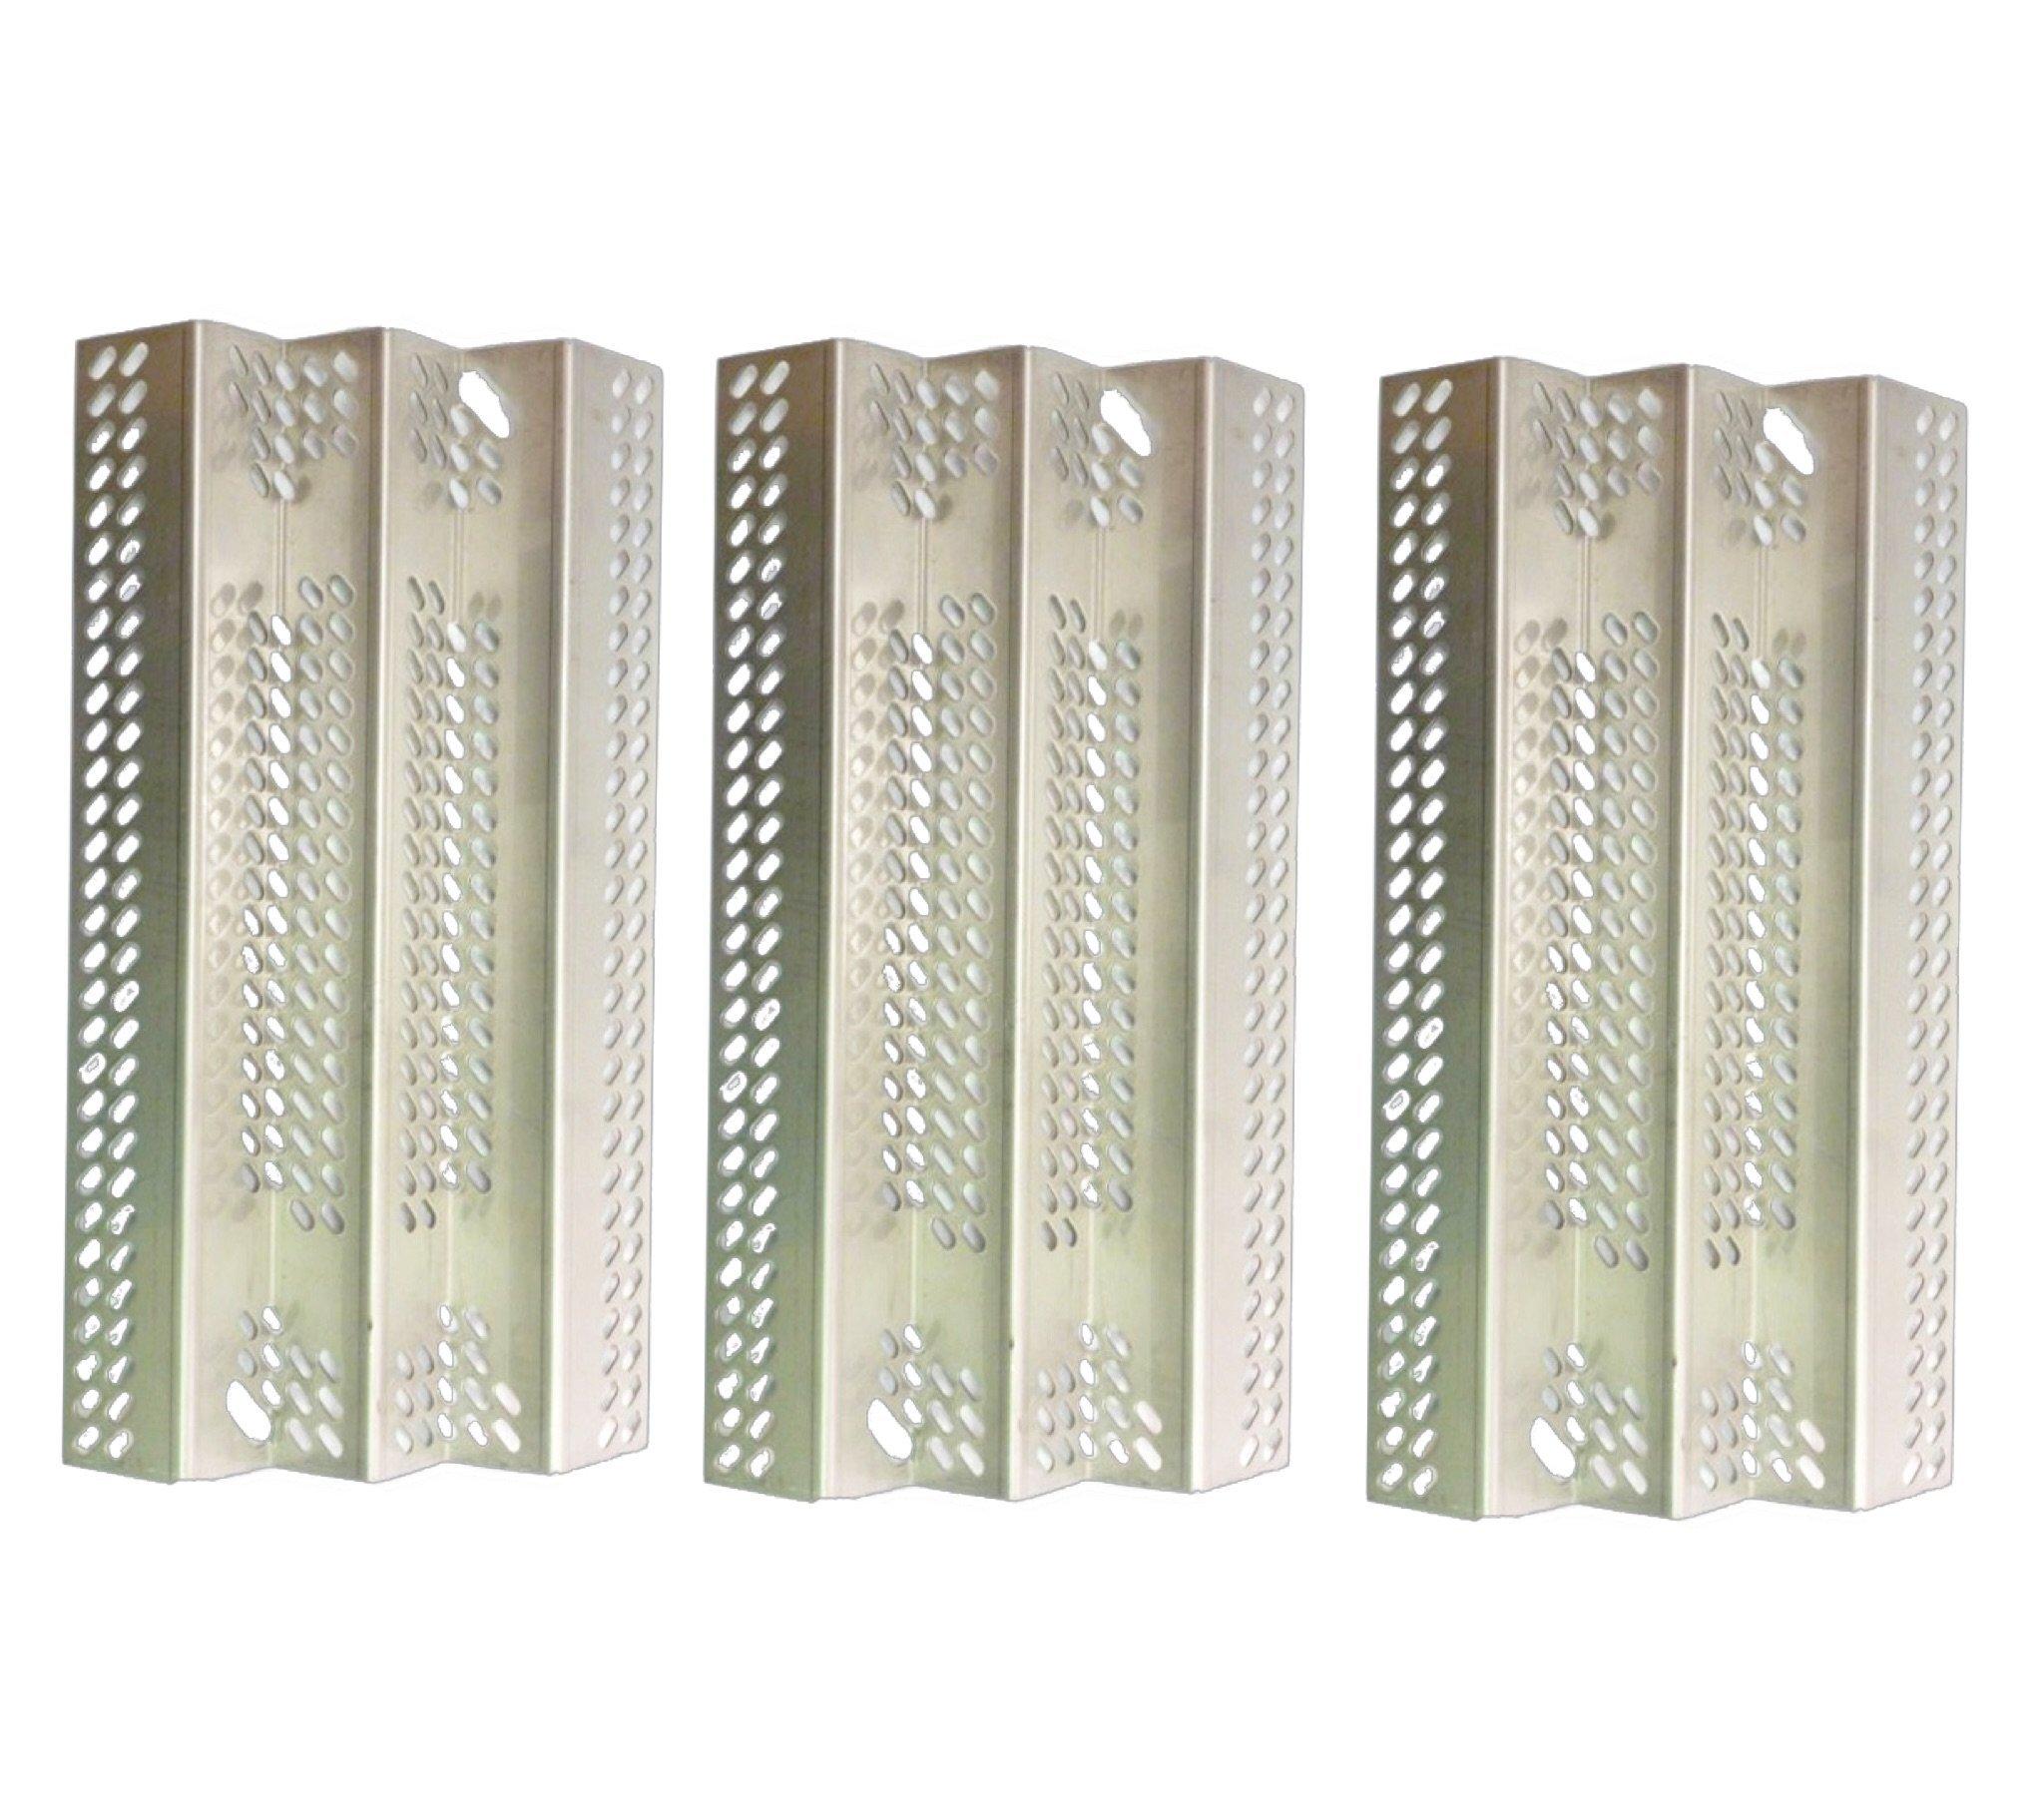 American Outdoor Grill 15 1/2'' X 24 7/8'' Shield Panel Set BCP30-B-05-3 OEM